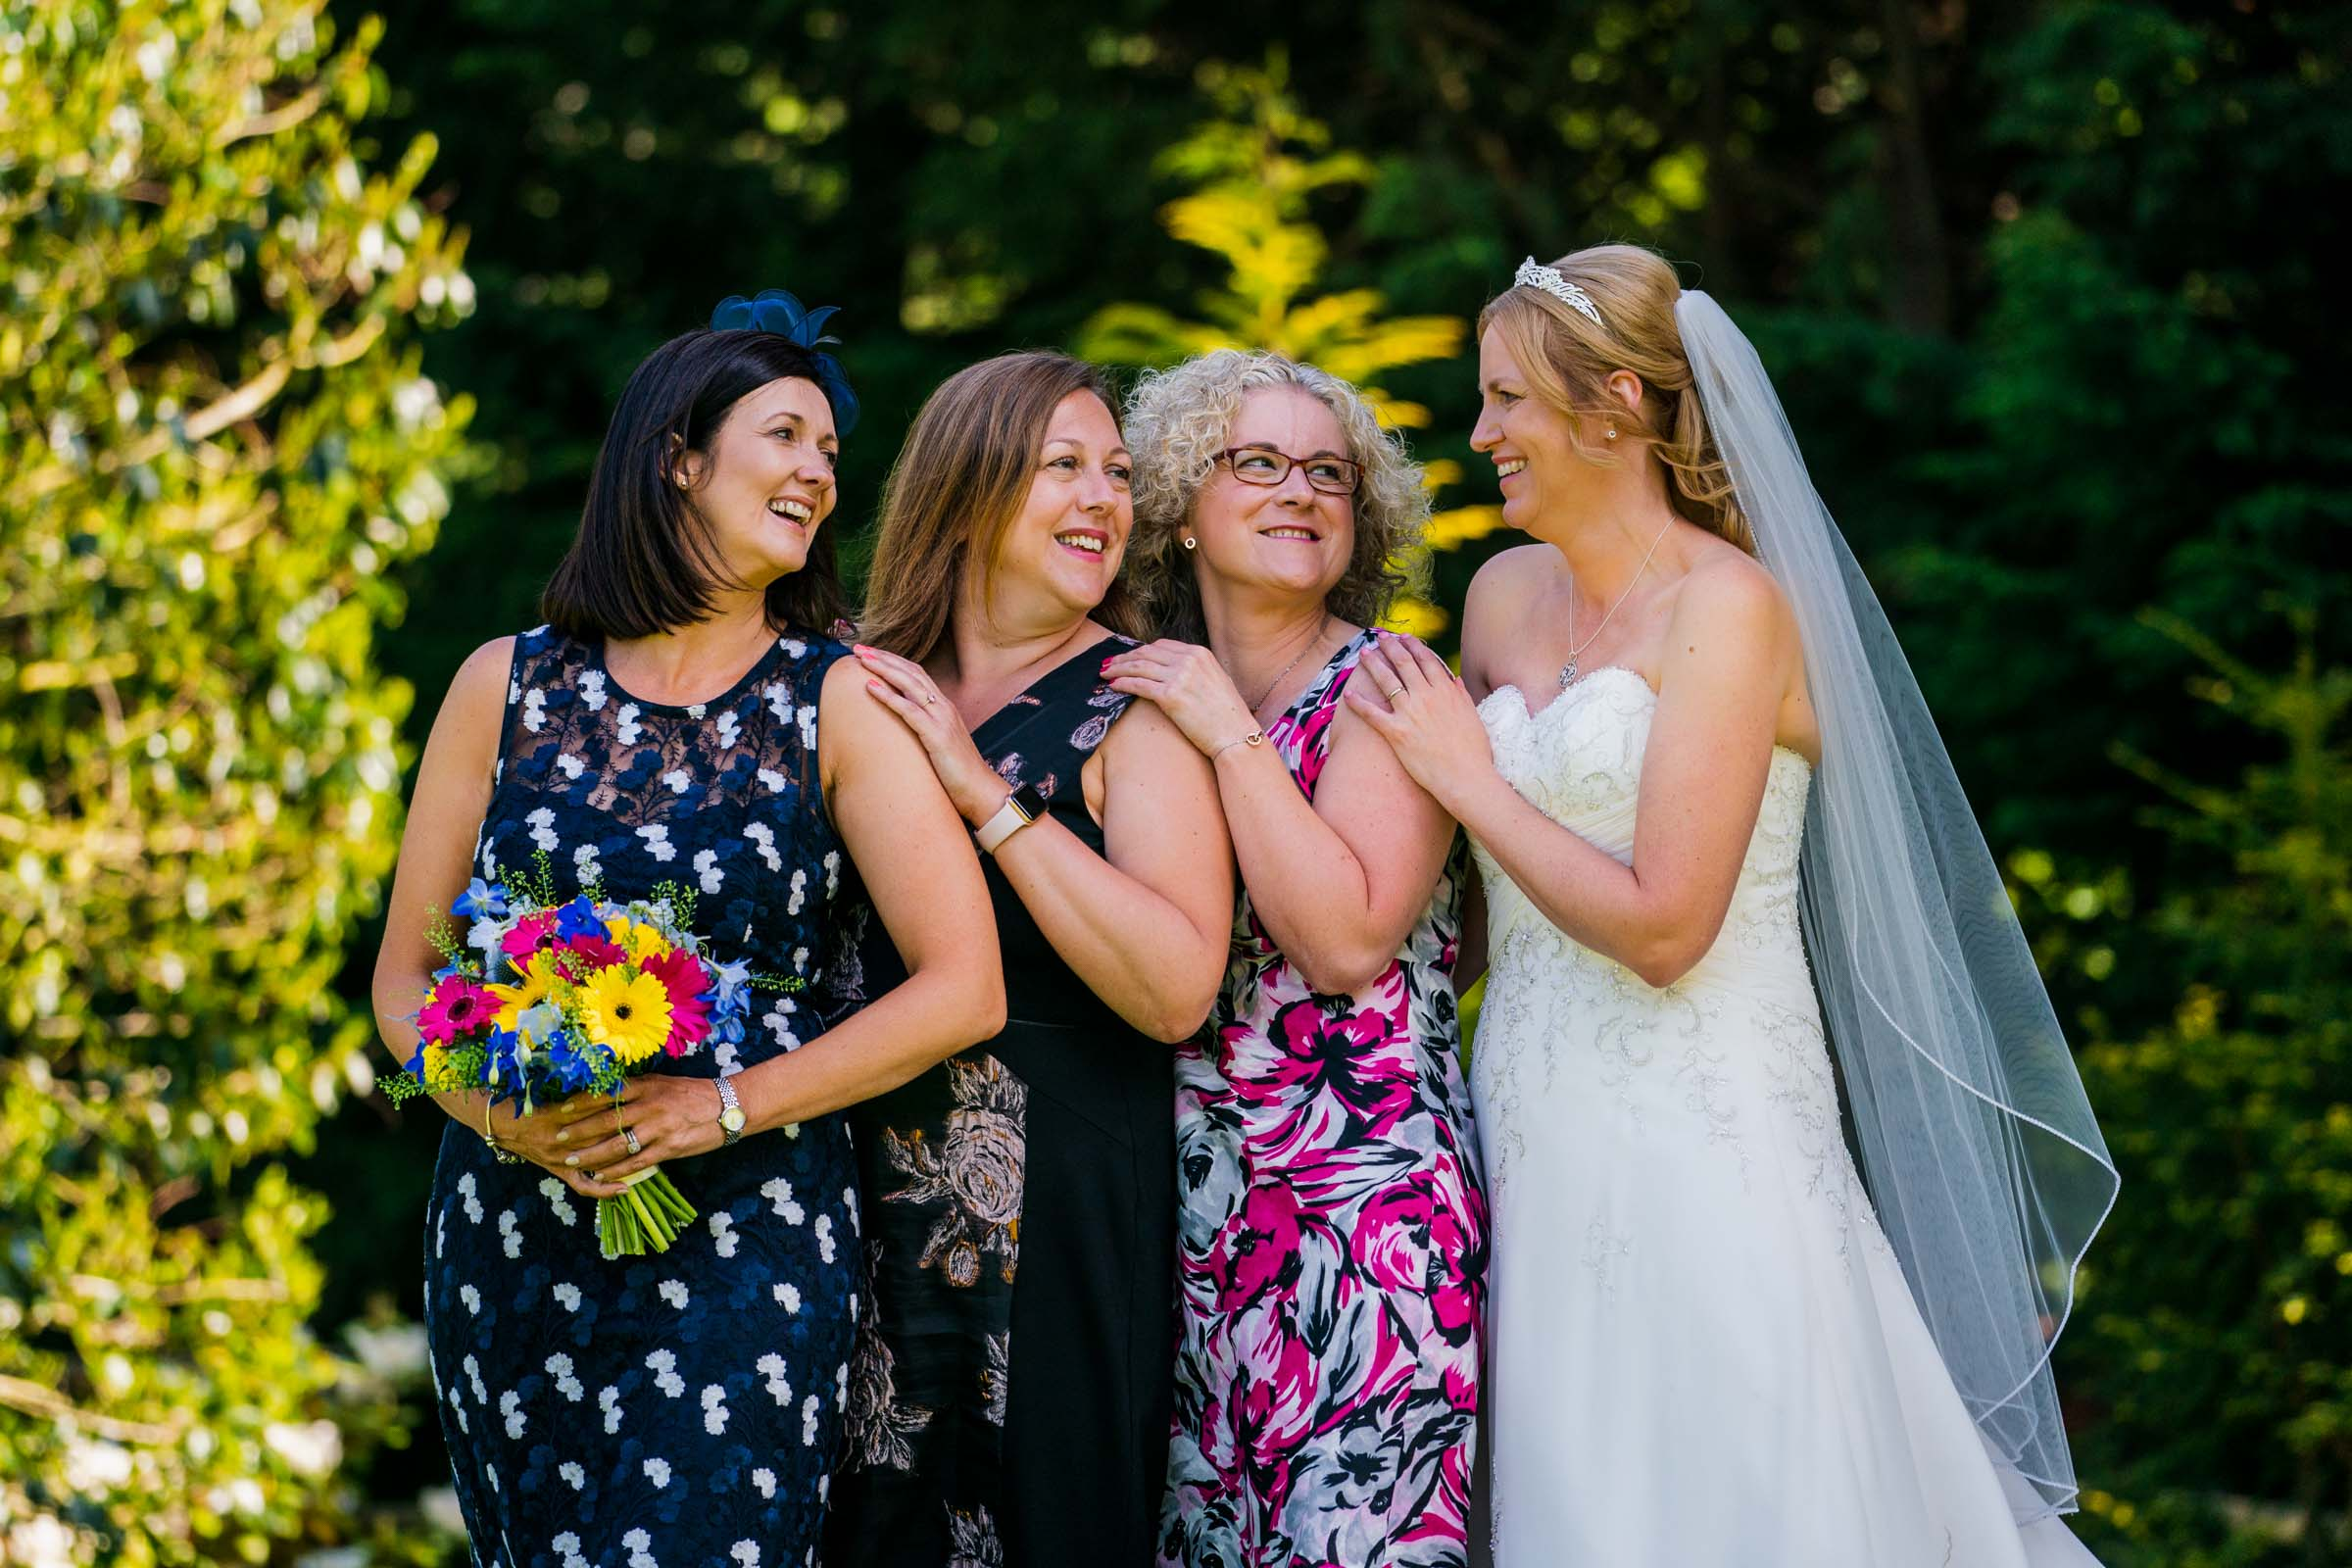 dalhousie-midlothian-wedding-dearlyphotography (6 of 10).jpg